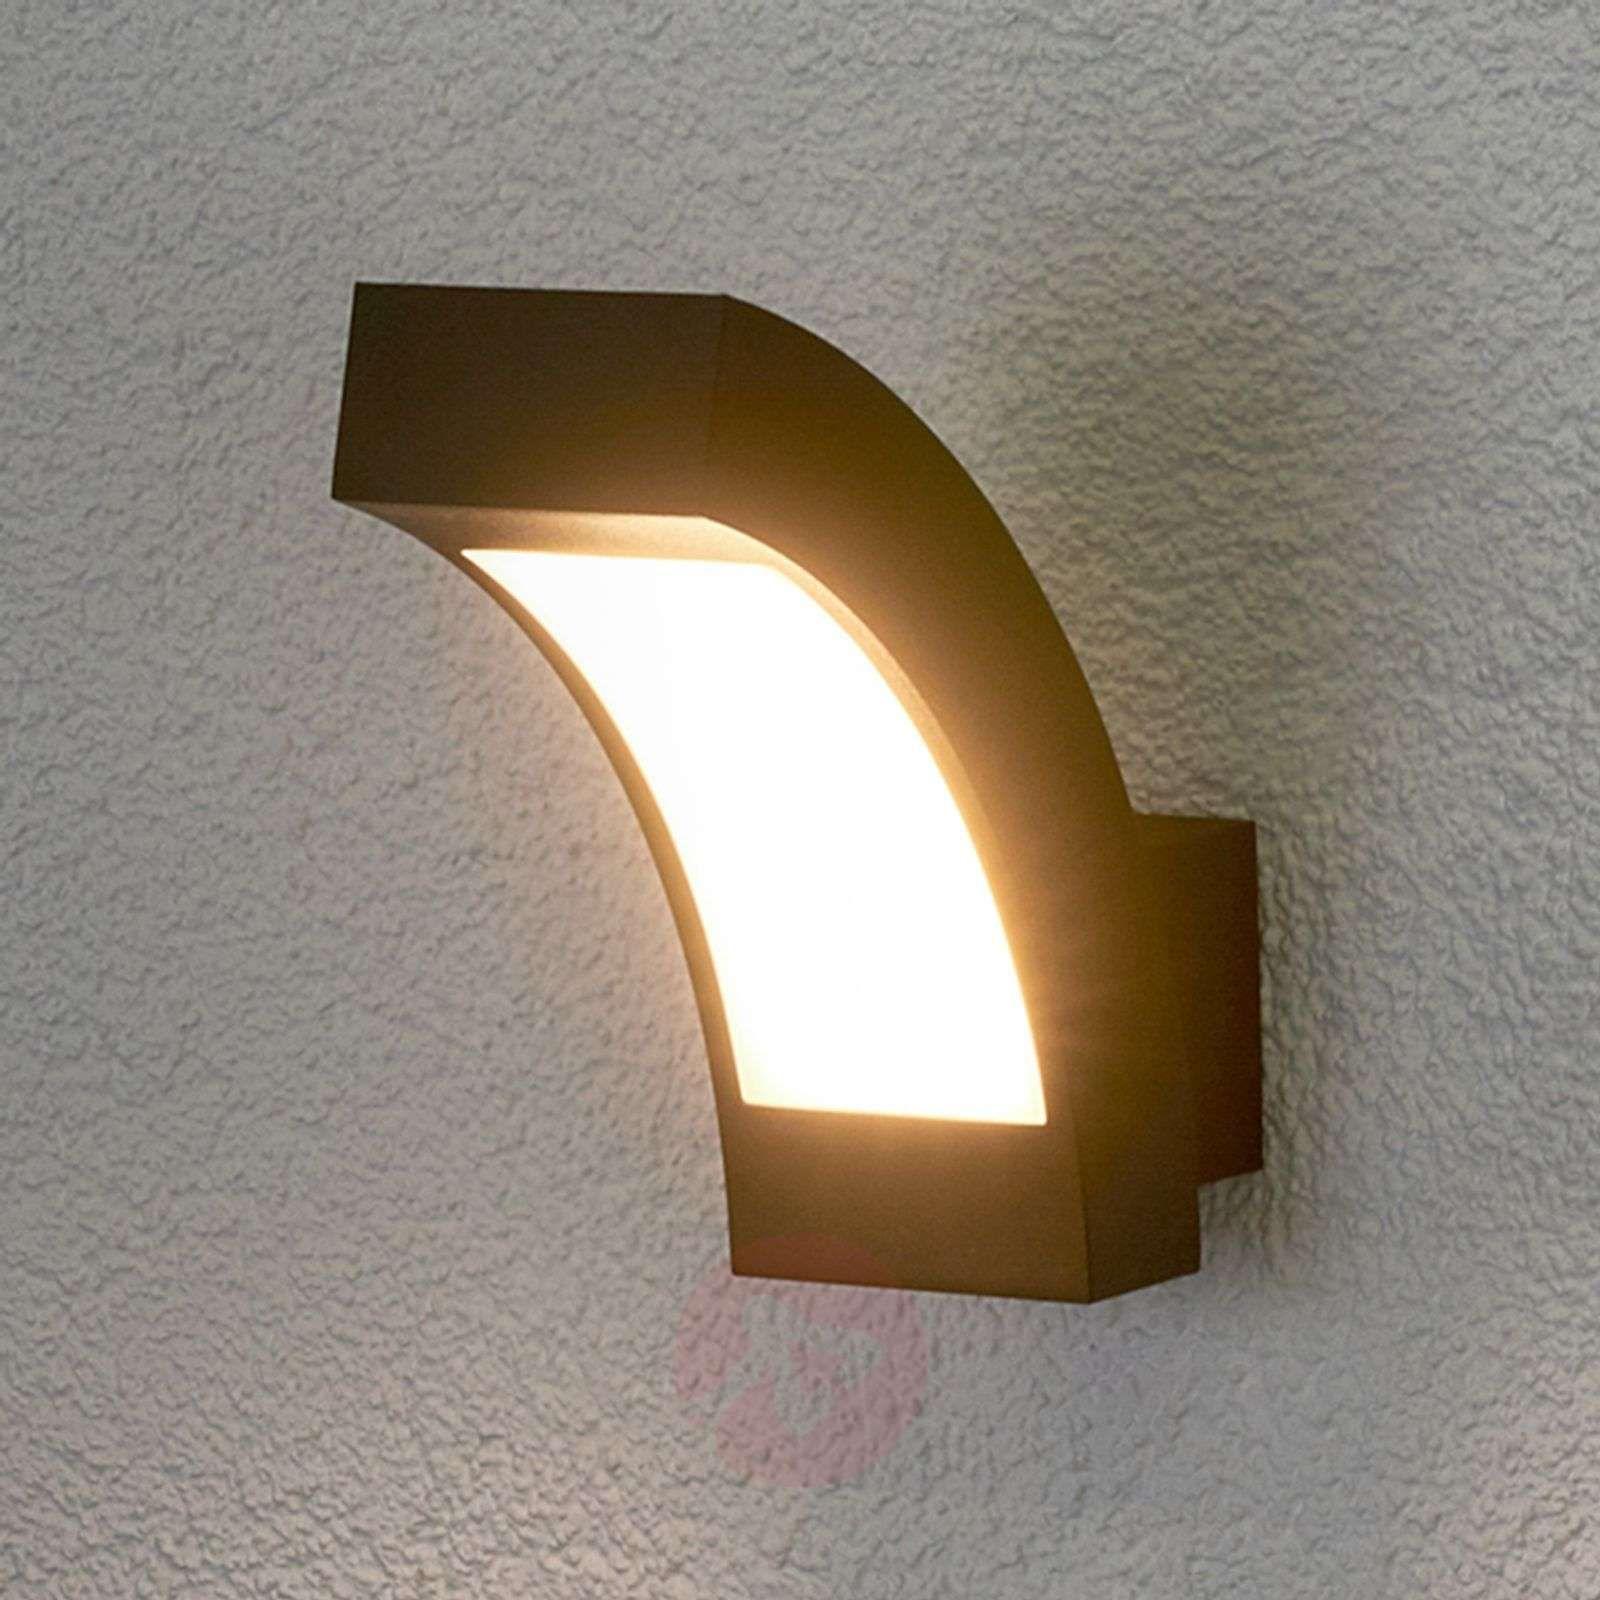 Pin By Marta Pippo On Oswietlenie Wall Lights Outdoor Wall Lighting Led Outdoor Wall Lights